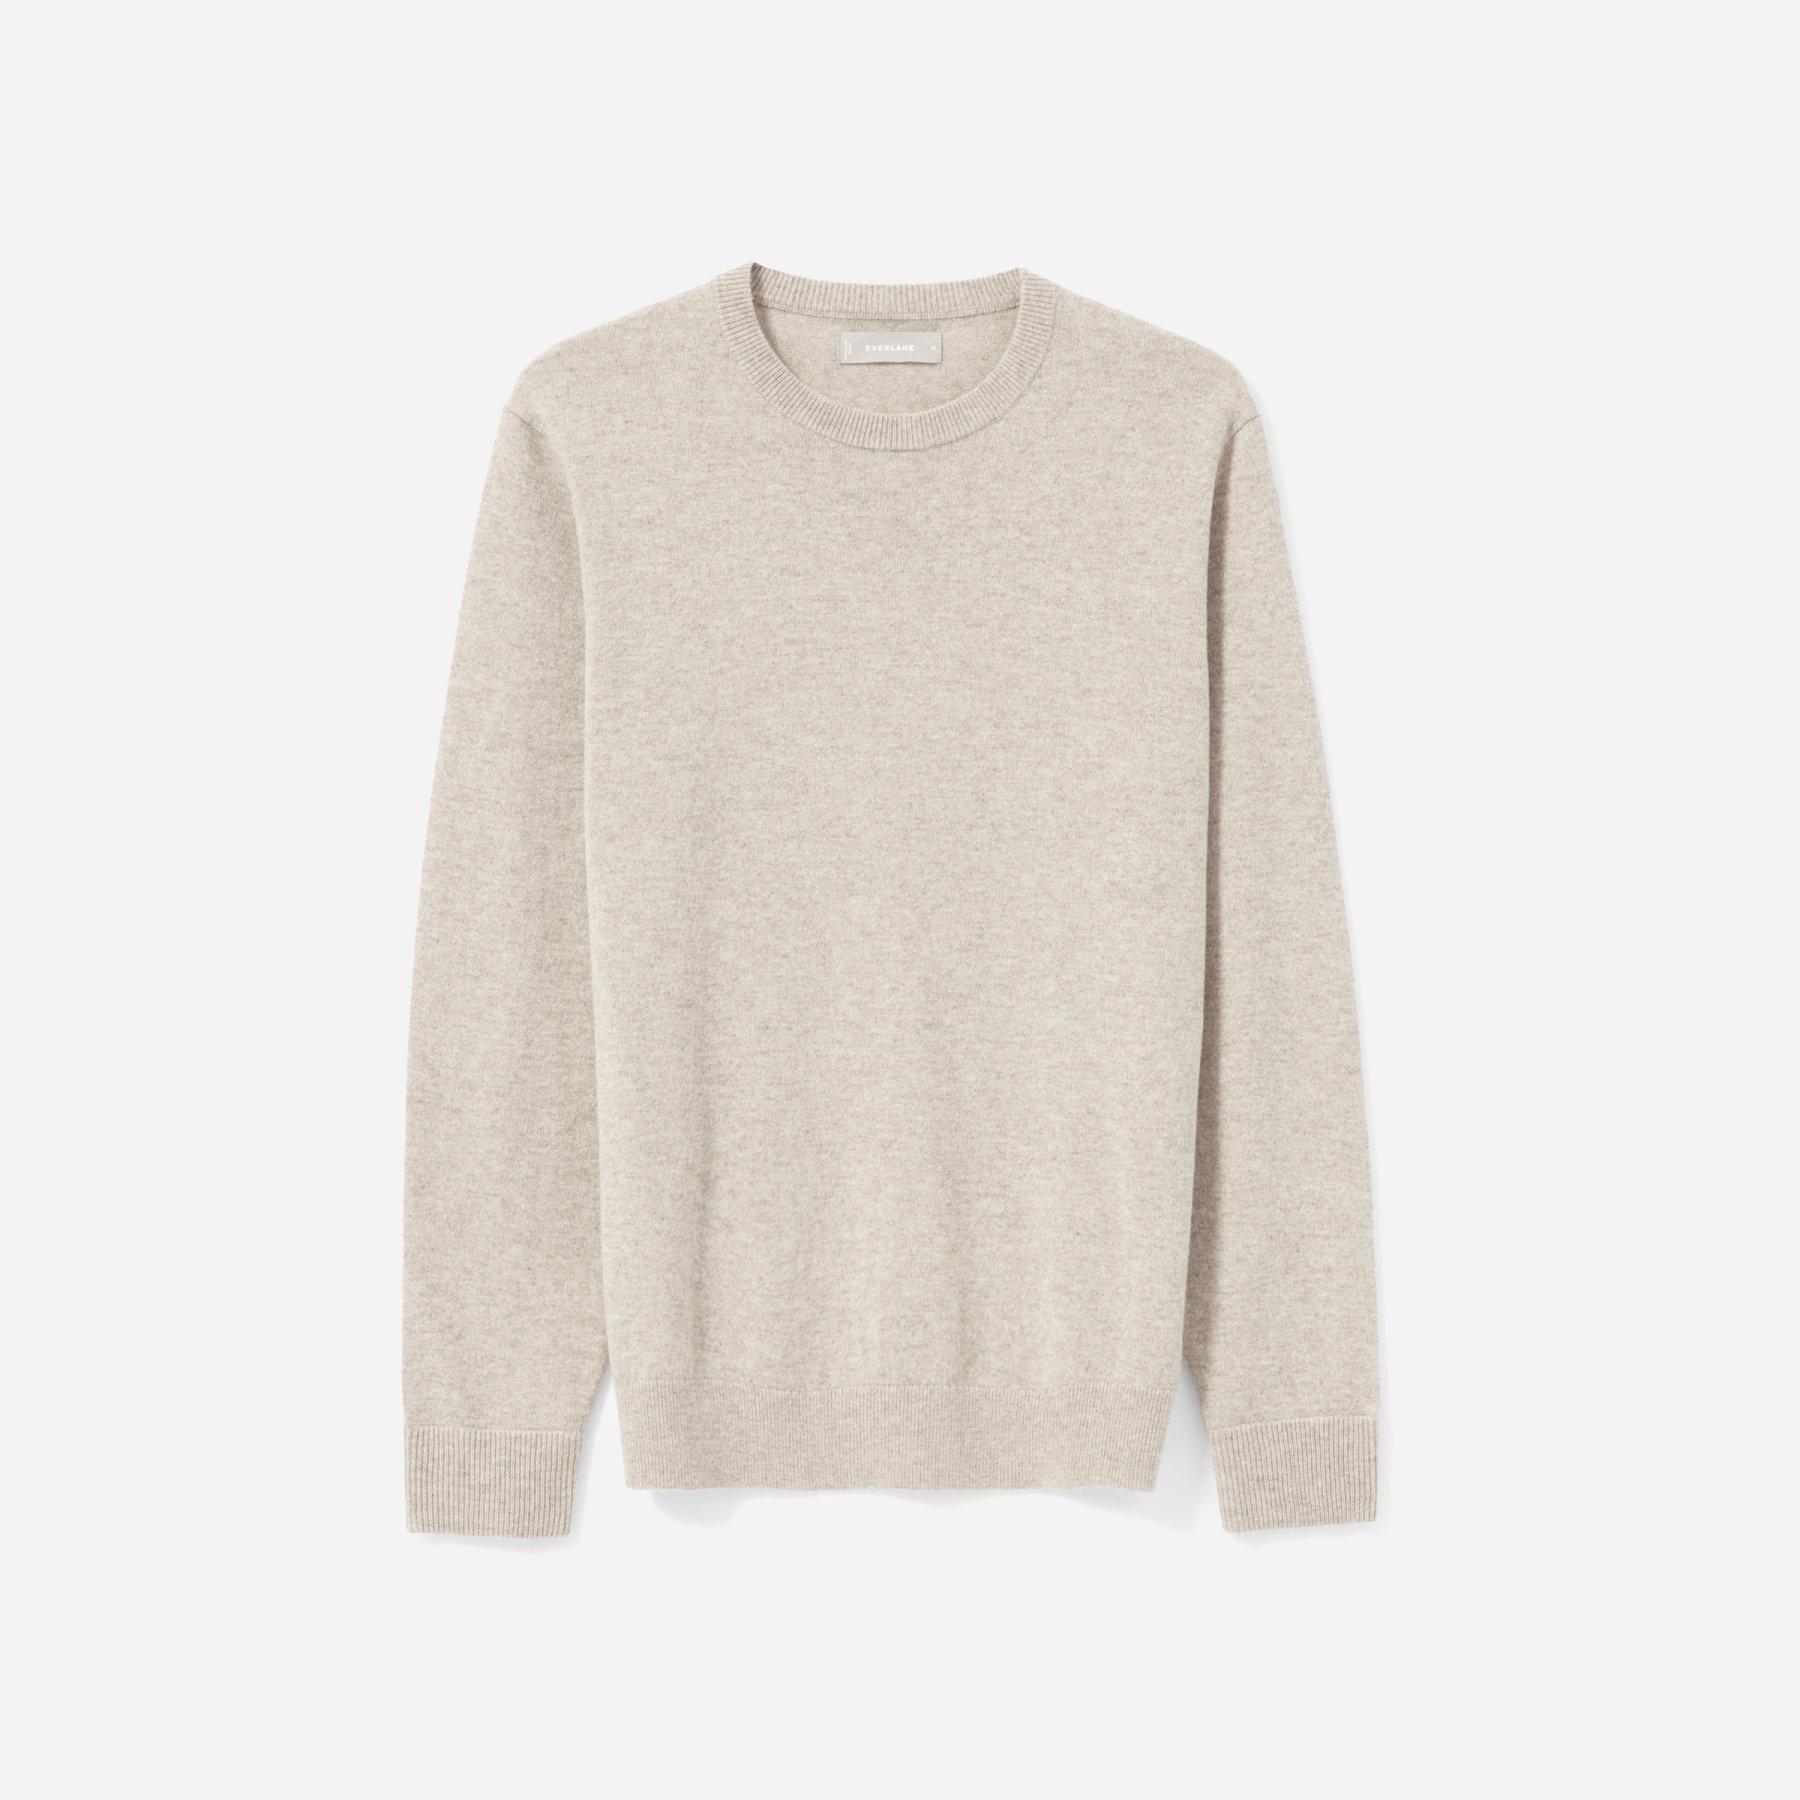 Everlane cashmere crew sweater.jpg